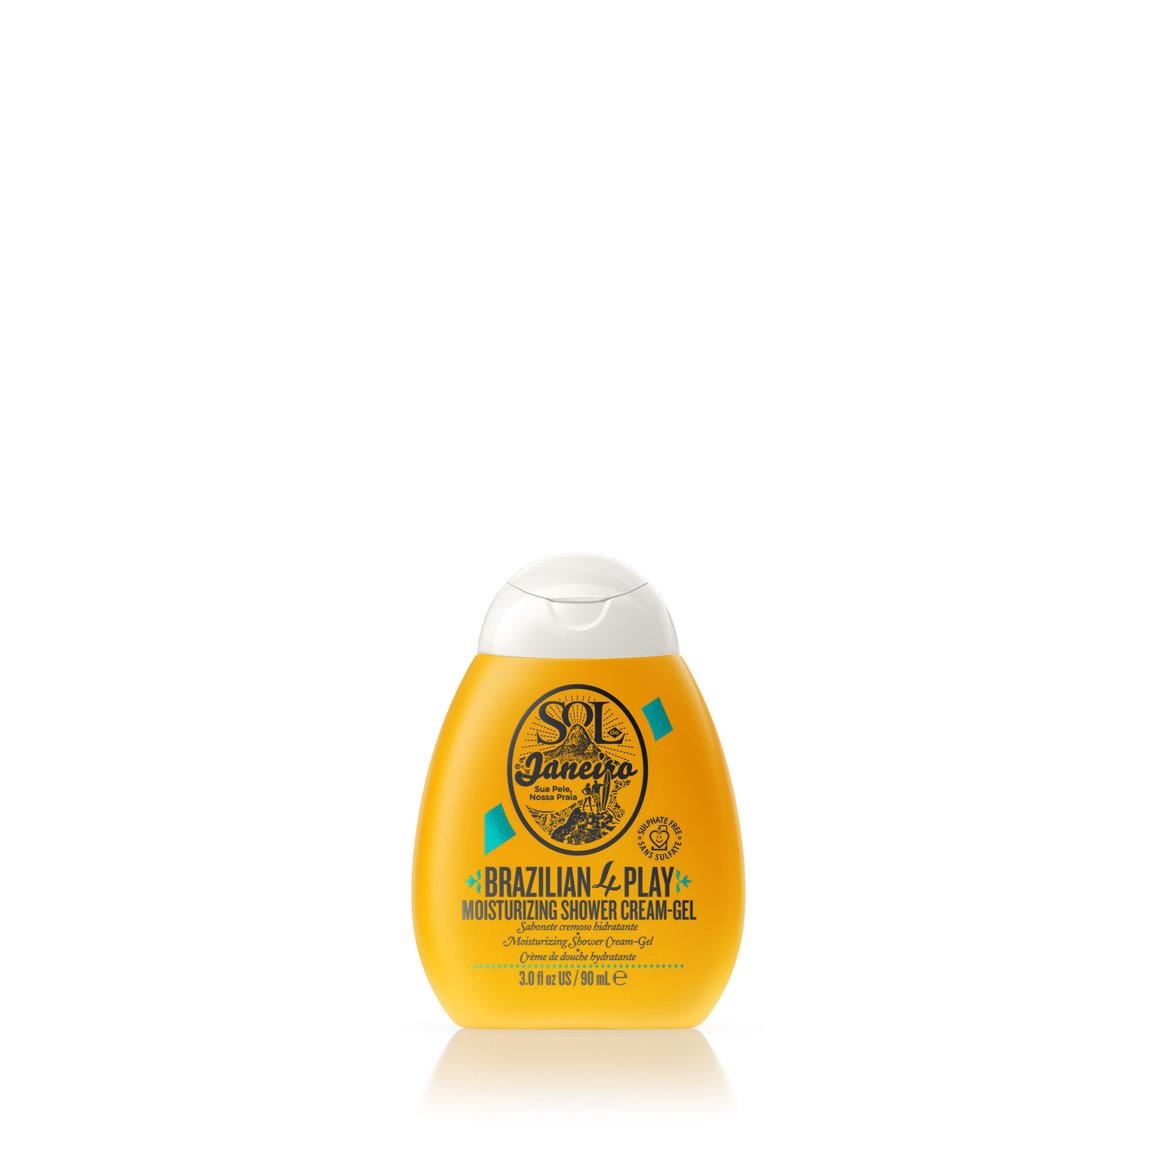 Sol de Janeiro Brazilian 4 Play Moisturizing Shower Cream-Gel 3.04 fl oz product swatch.